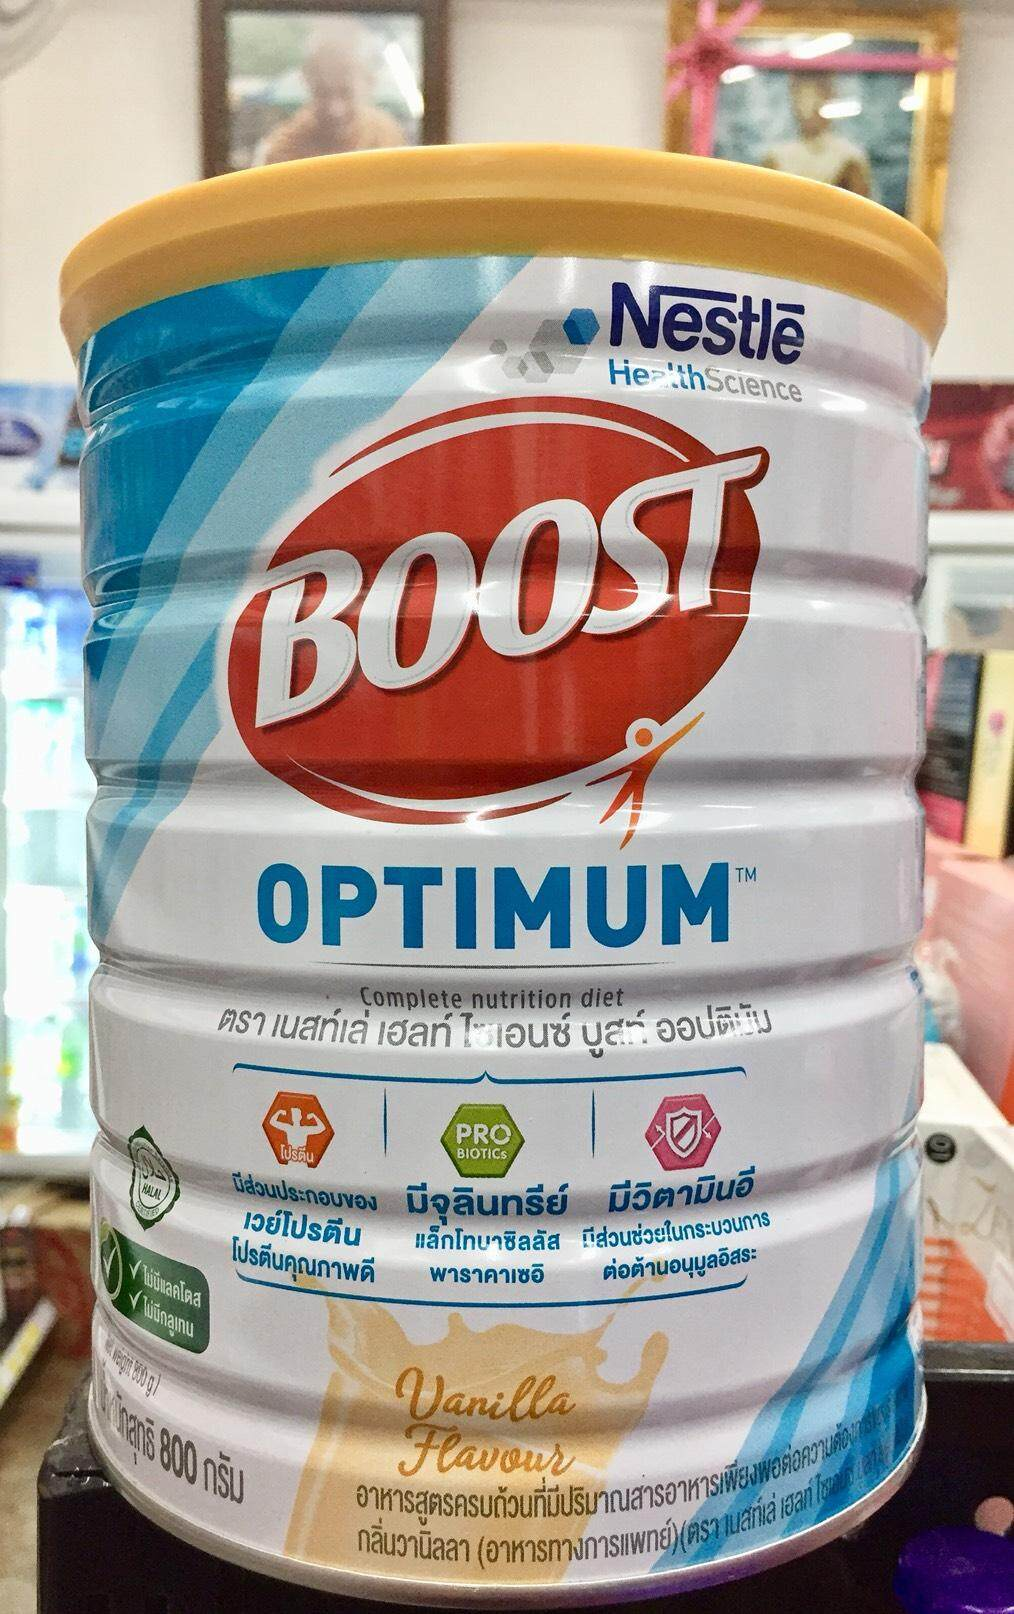 Nestle Boost Optimum เนสท์เล่ บูสท์ ออปติมัม 800กรัม *อาหารทางการแพทย์สูตรครบถ้วน มีเวย์โปรตีน สำหรับผู้สูงอายุ By Kankanitmaneein.